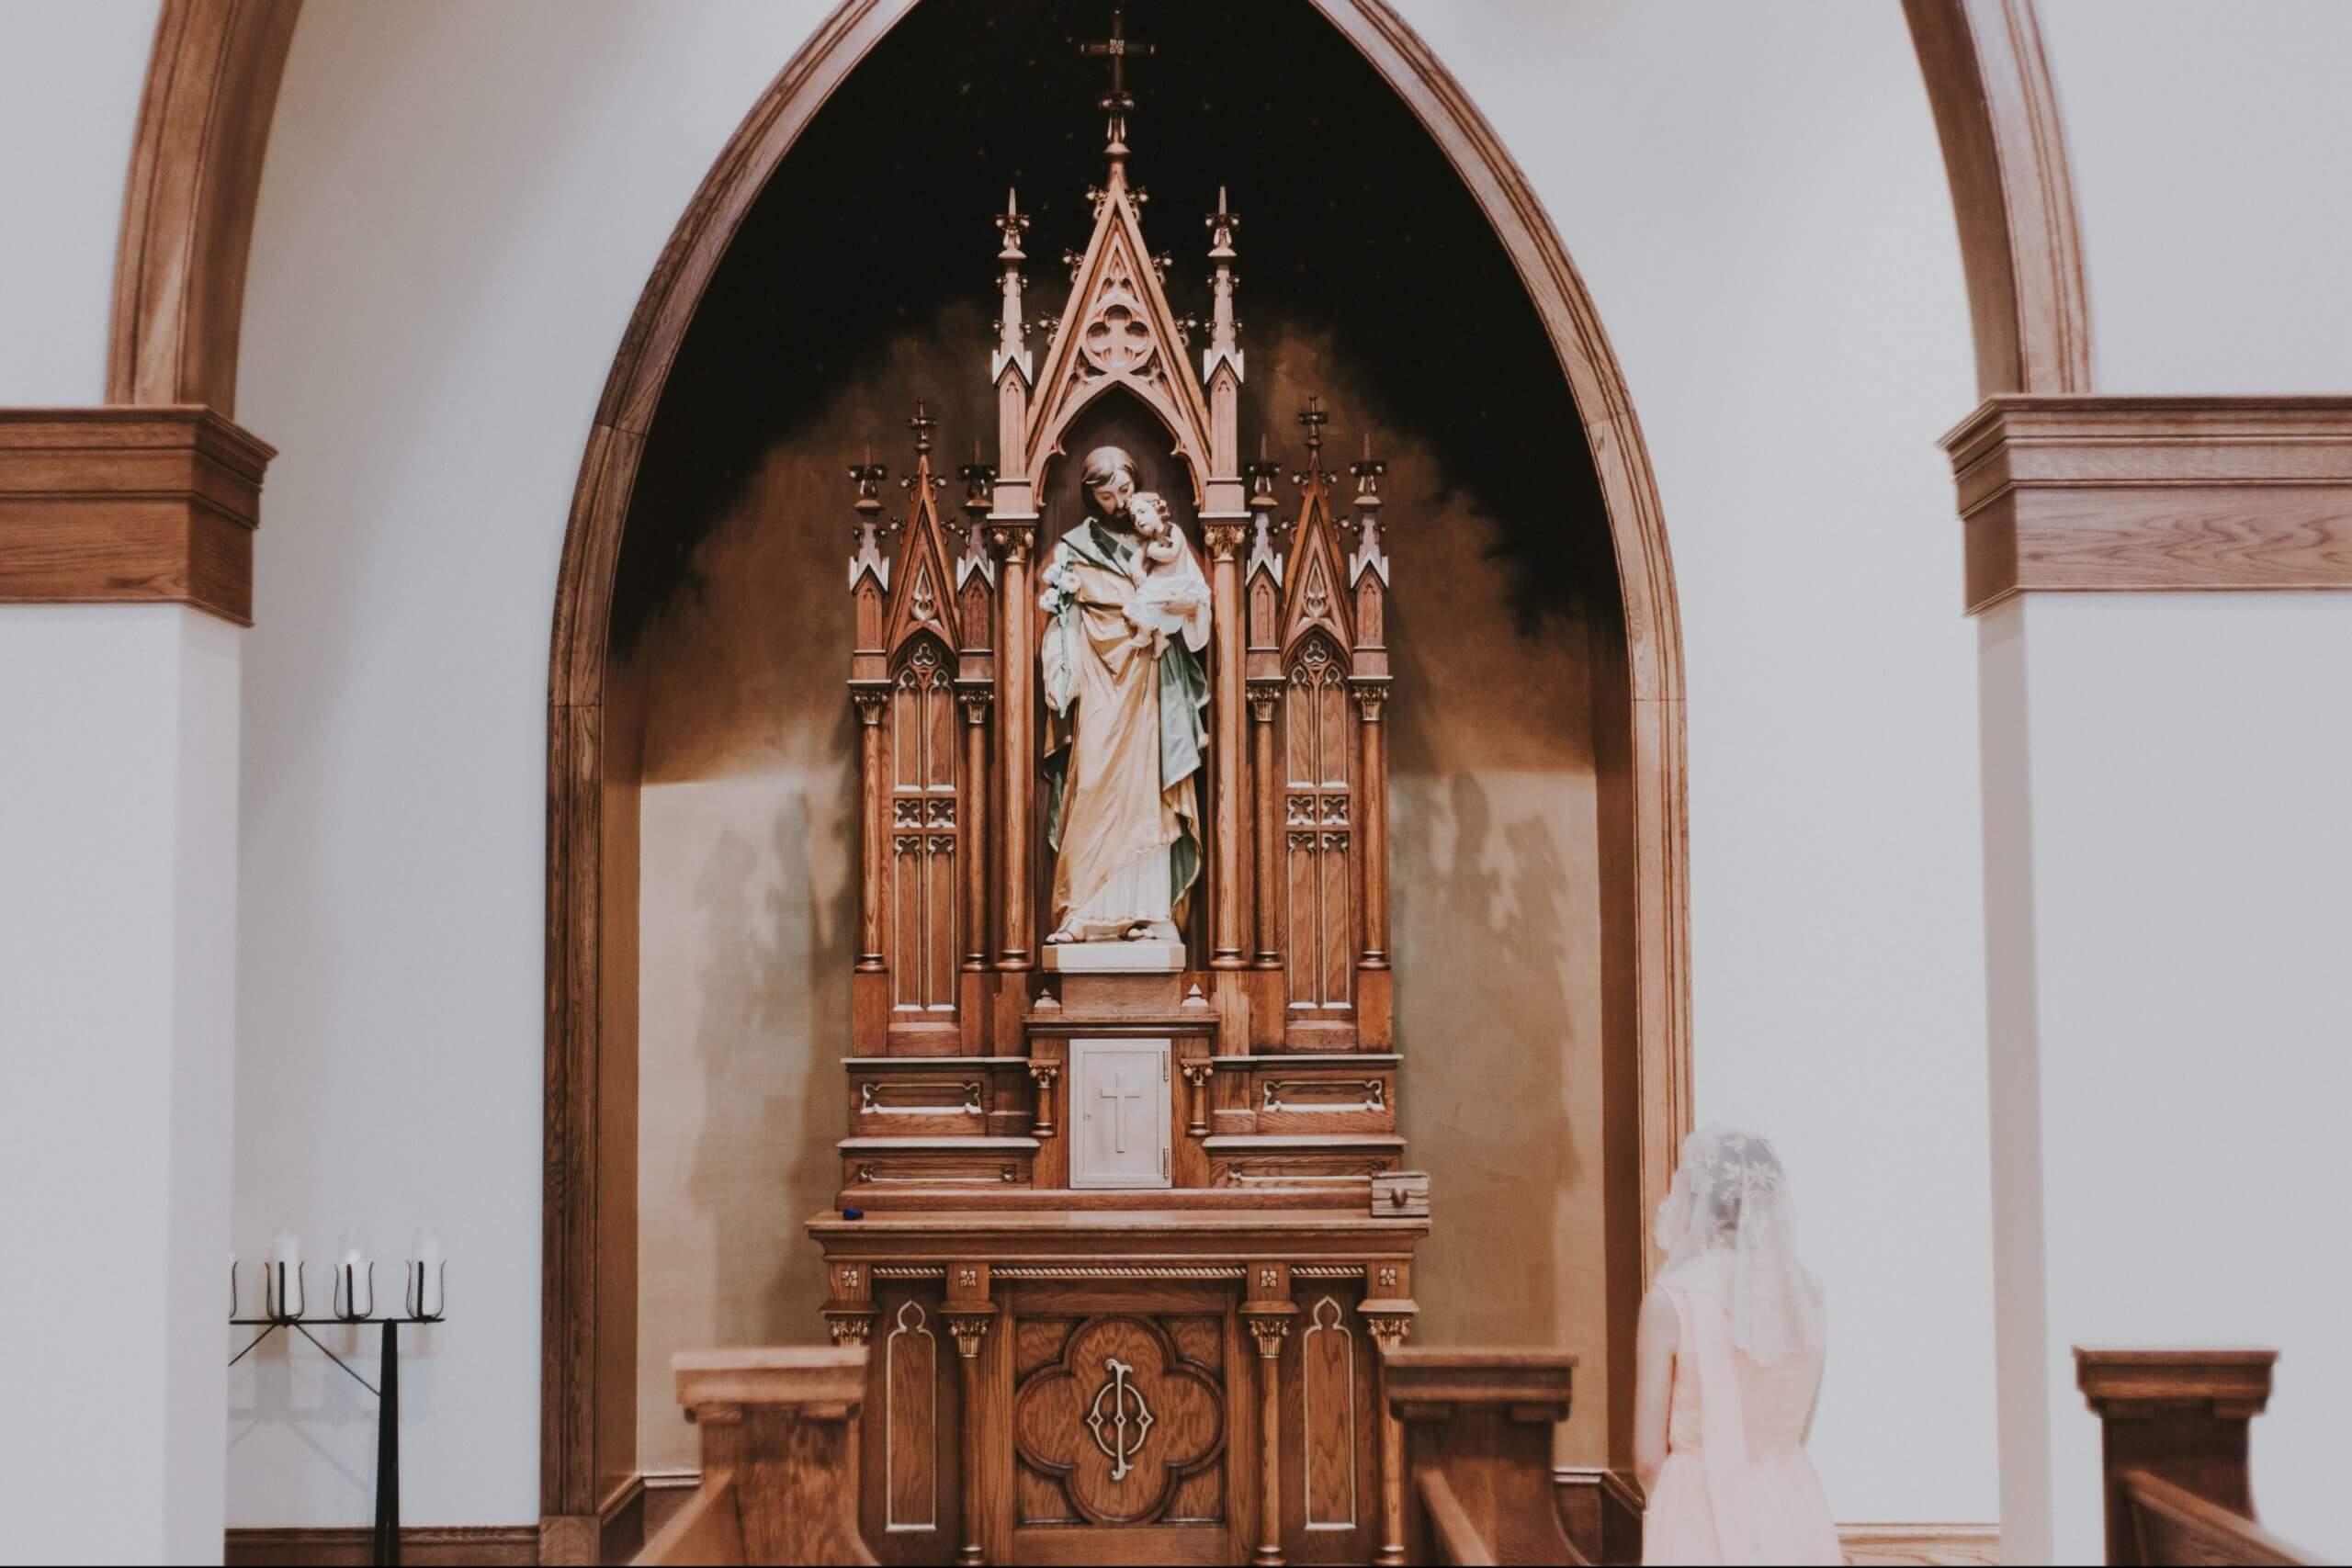 Saint single patron women of Patron Saint